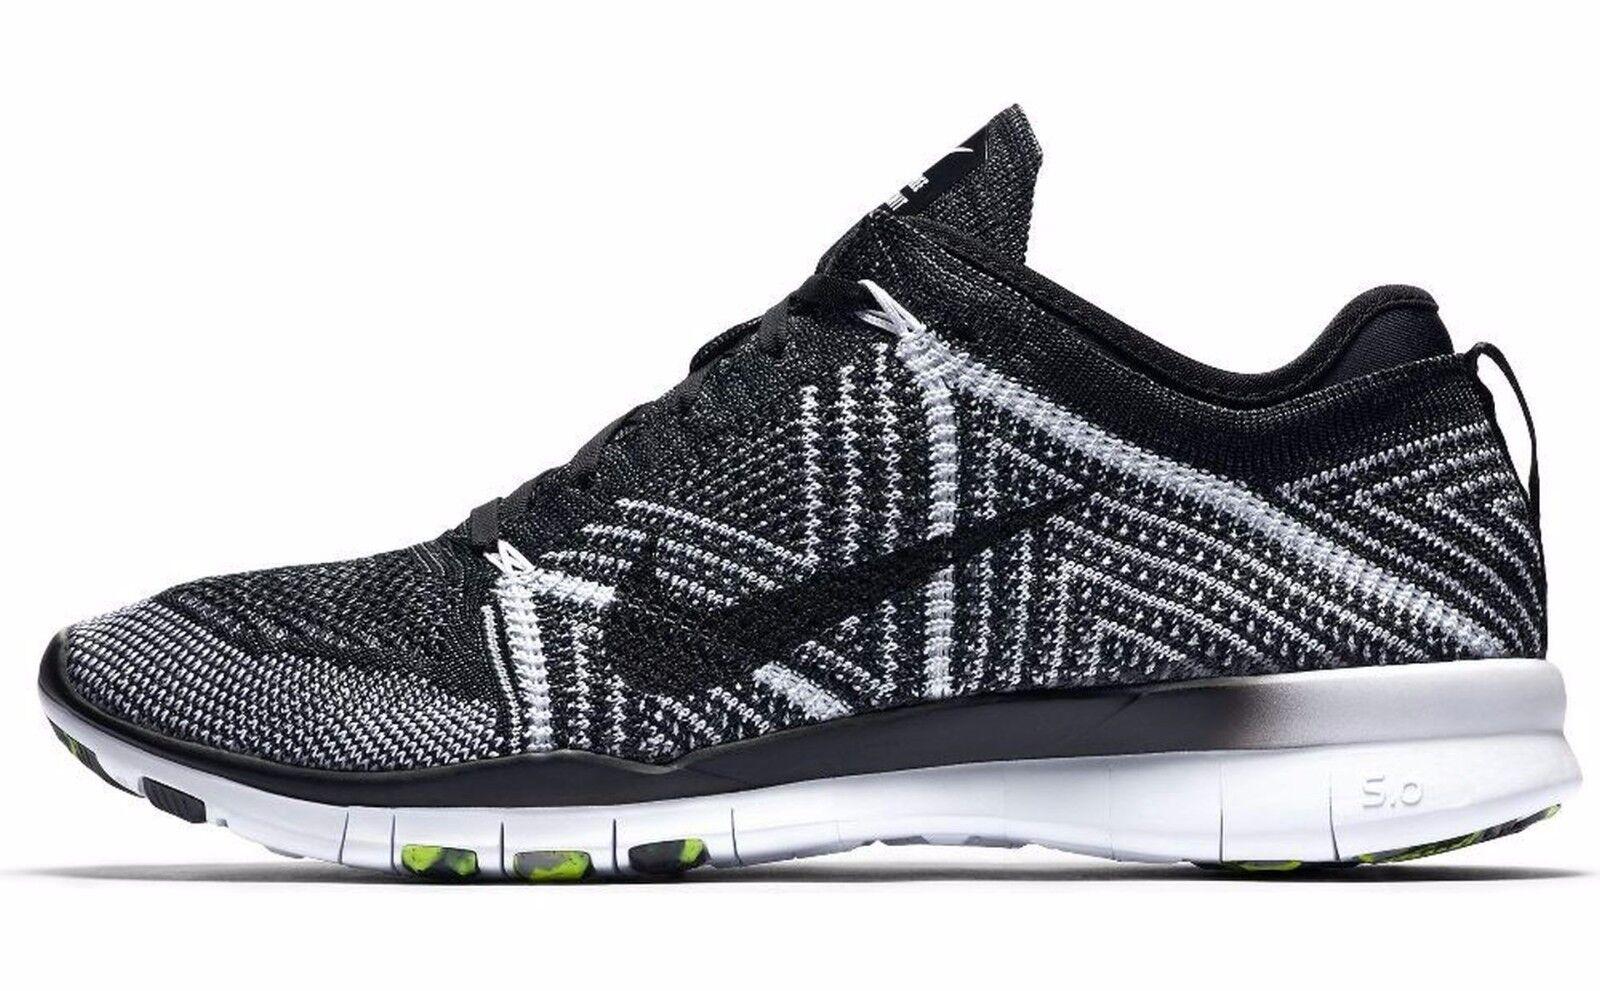 Nike WMNS Free TR F785-004 Black White Volt ,,Oreo